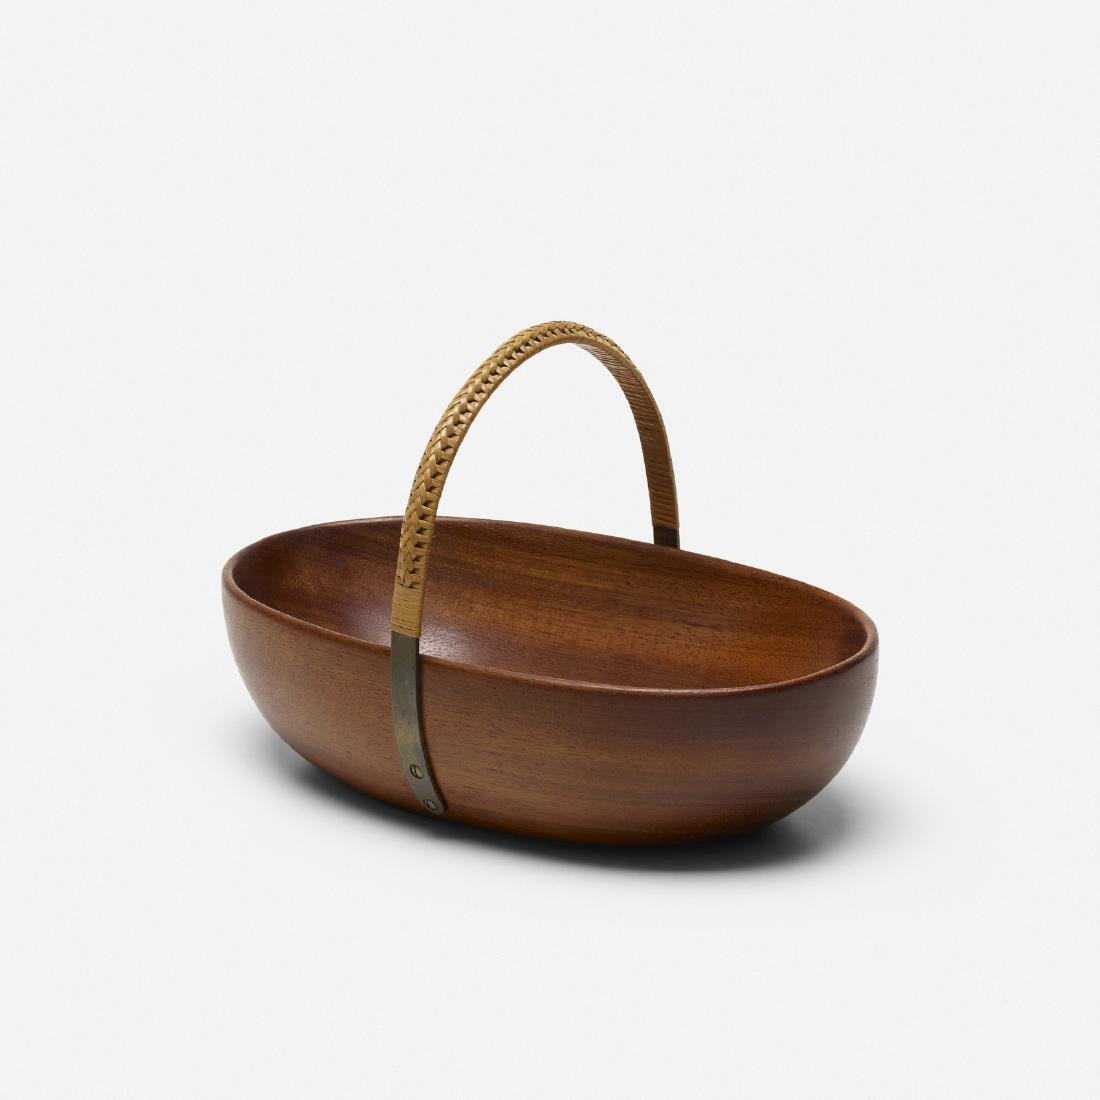 Carl Aubock II, nut bowl, model A-436